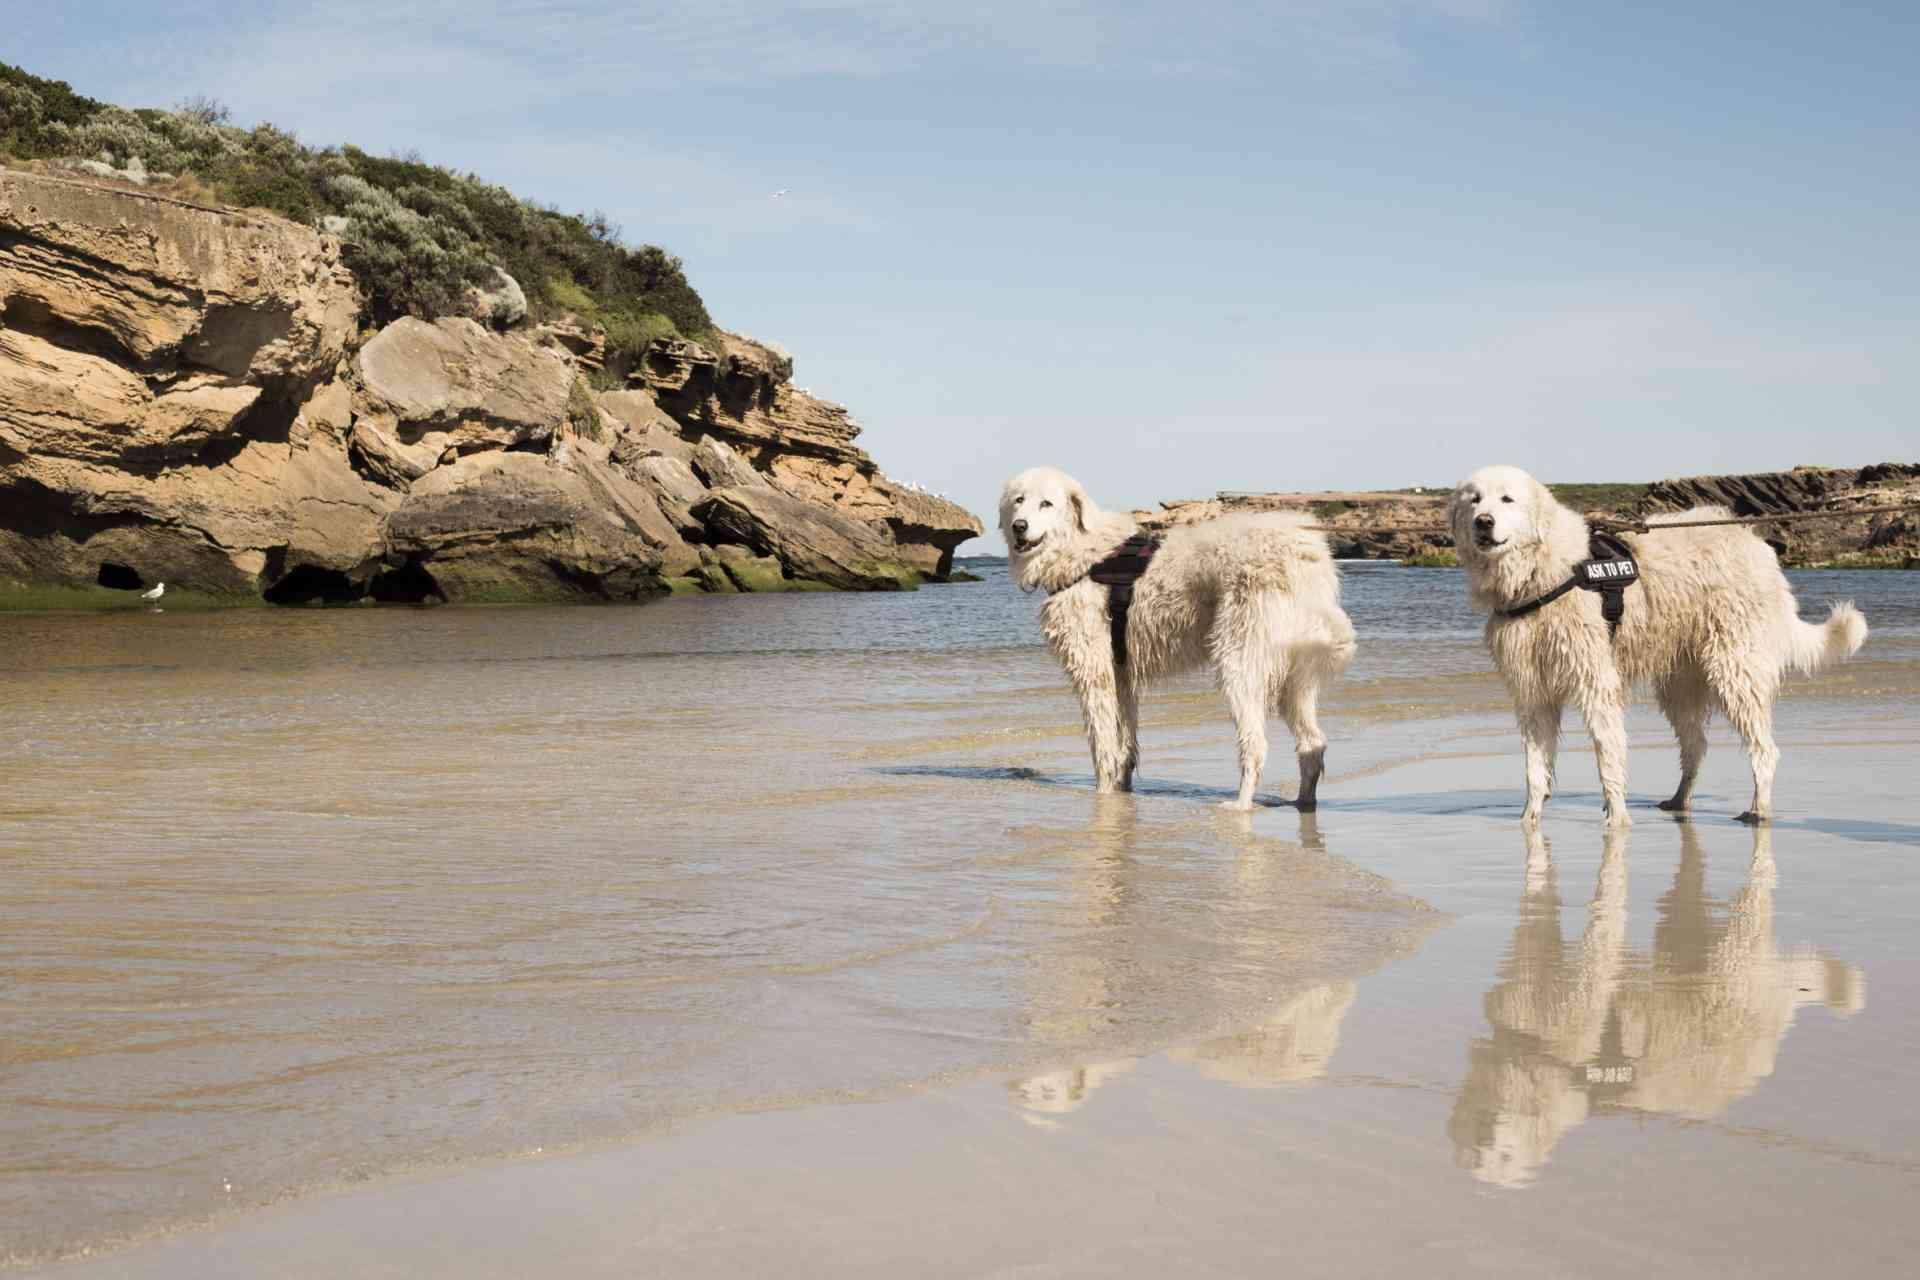 Maremma dogs near Warrnambool, Victoria by Visit Victoria